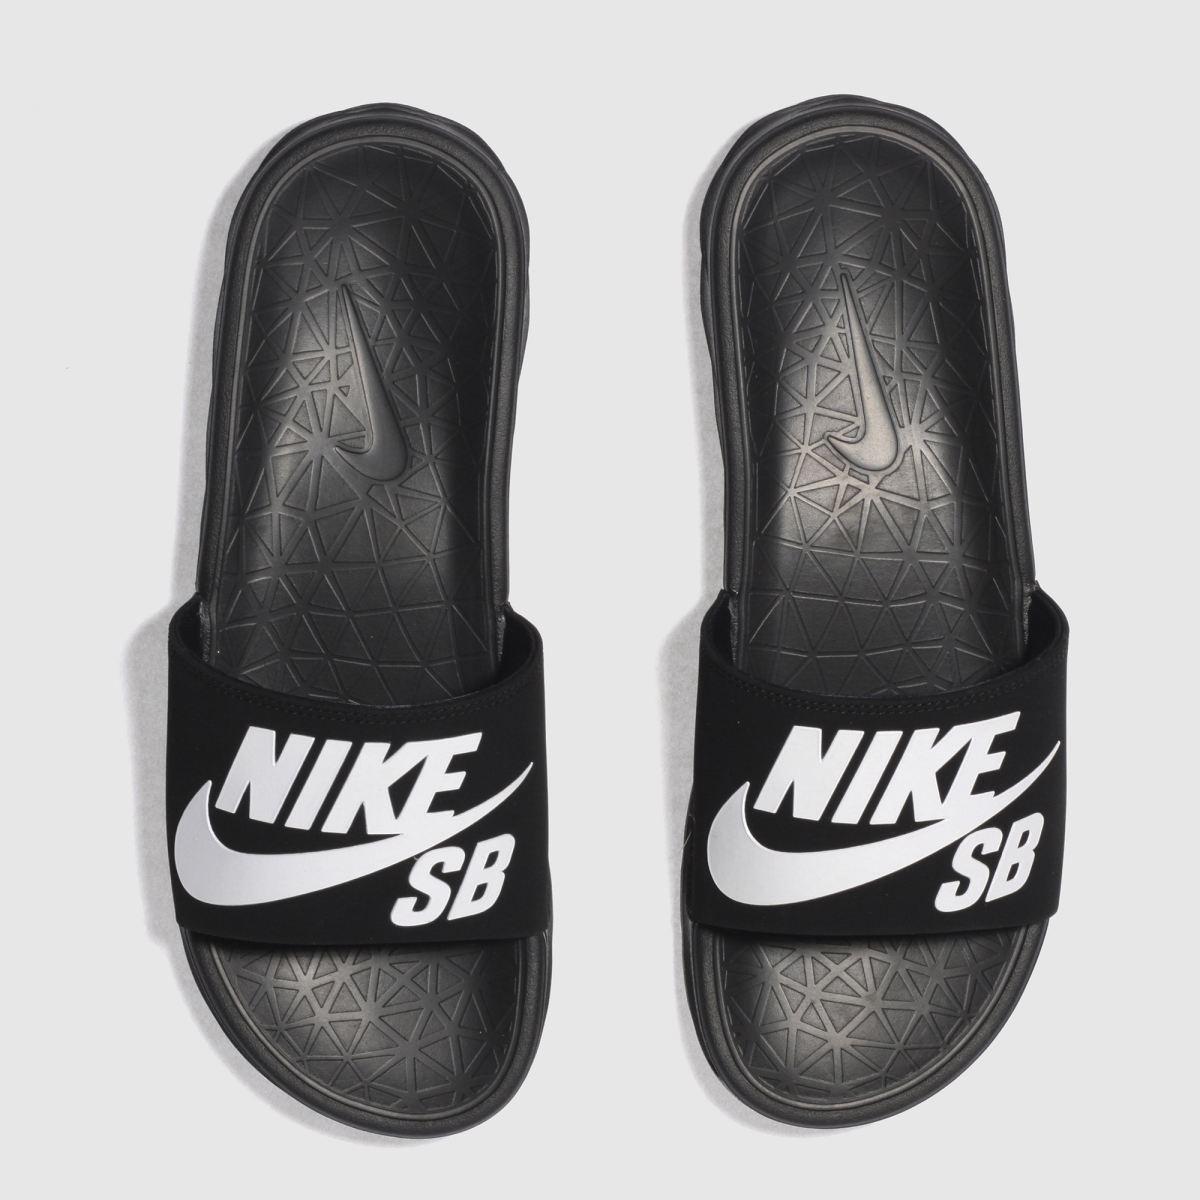 Nike SB Nike Sb Black & White Benassi Solarsoft Sandals